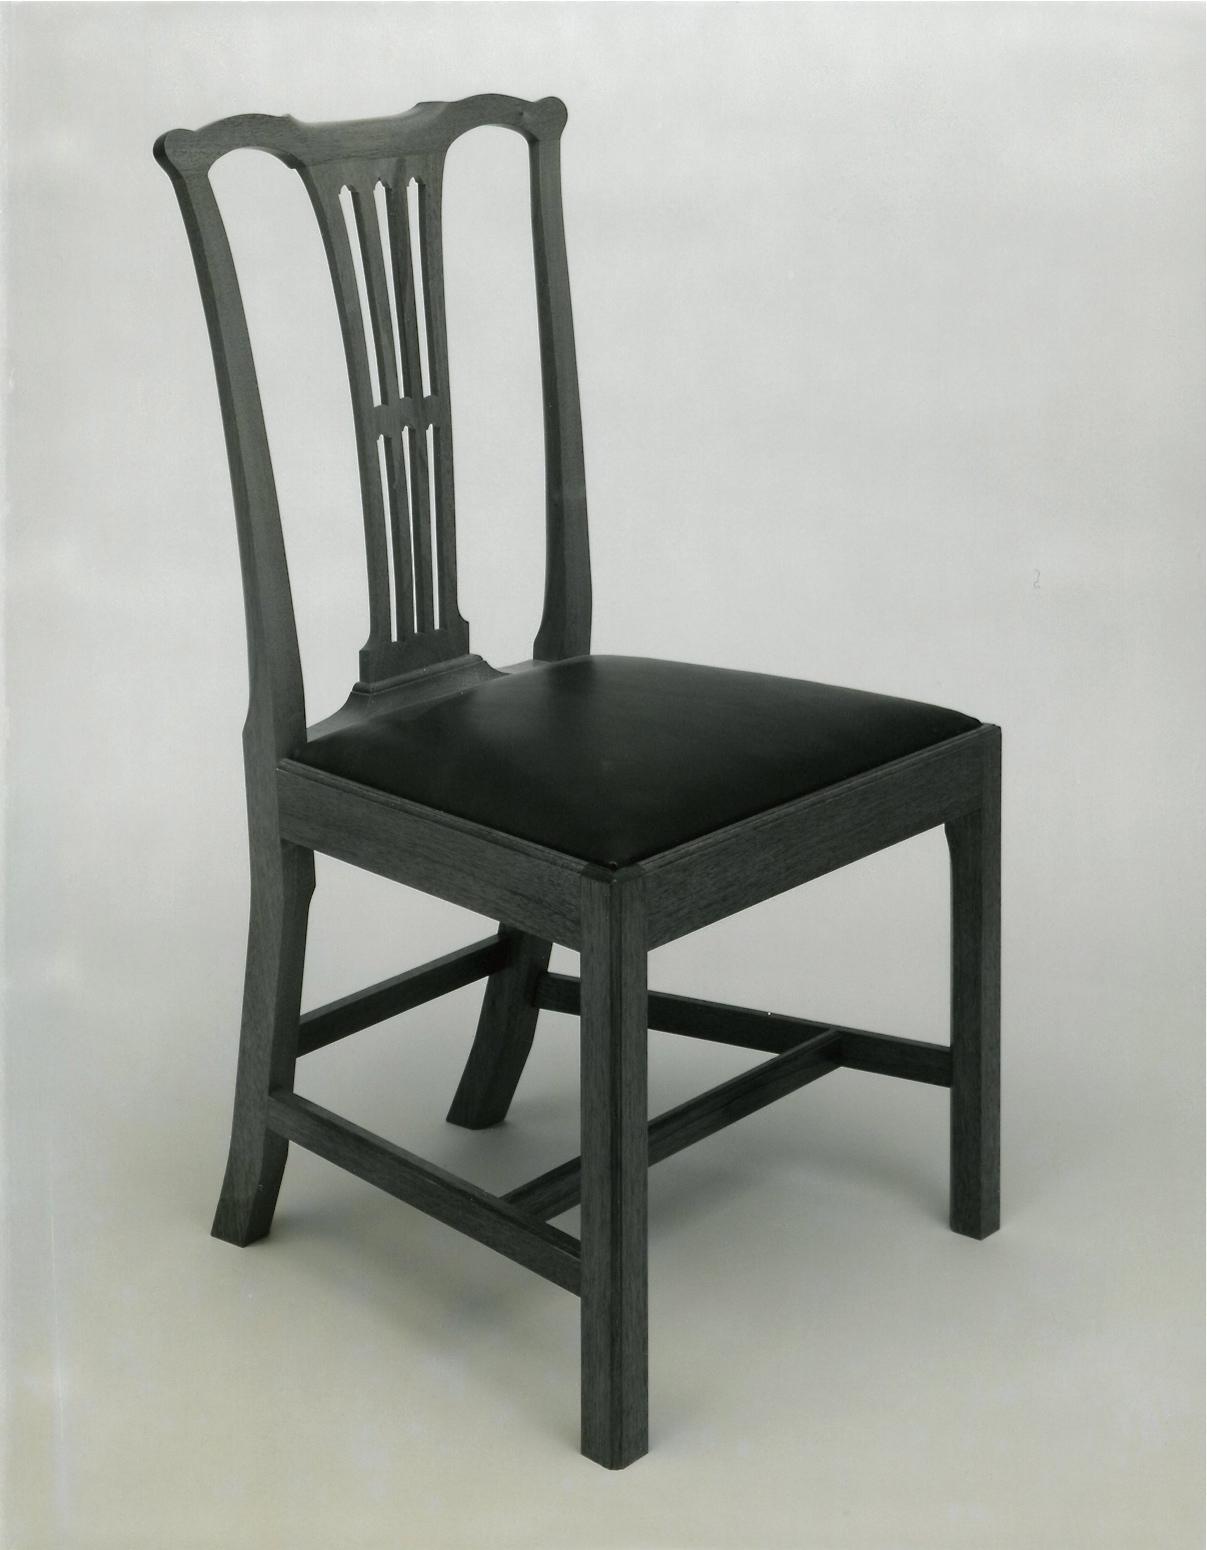 chip chair002new2.jpg